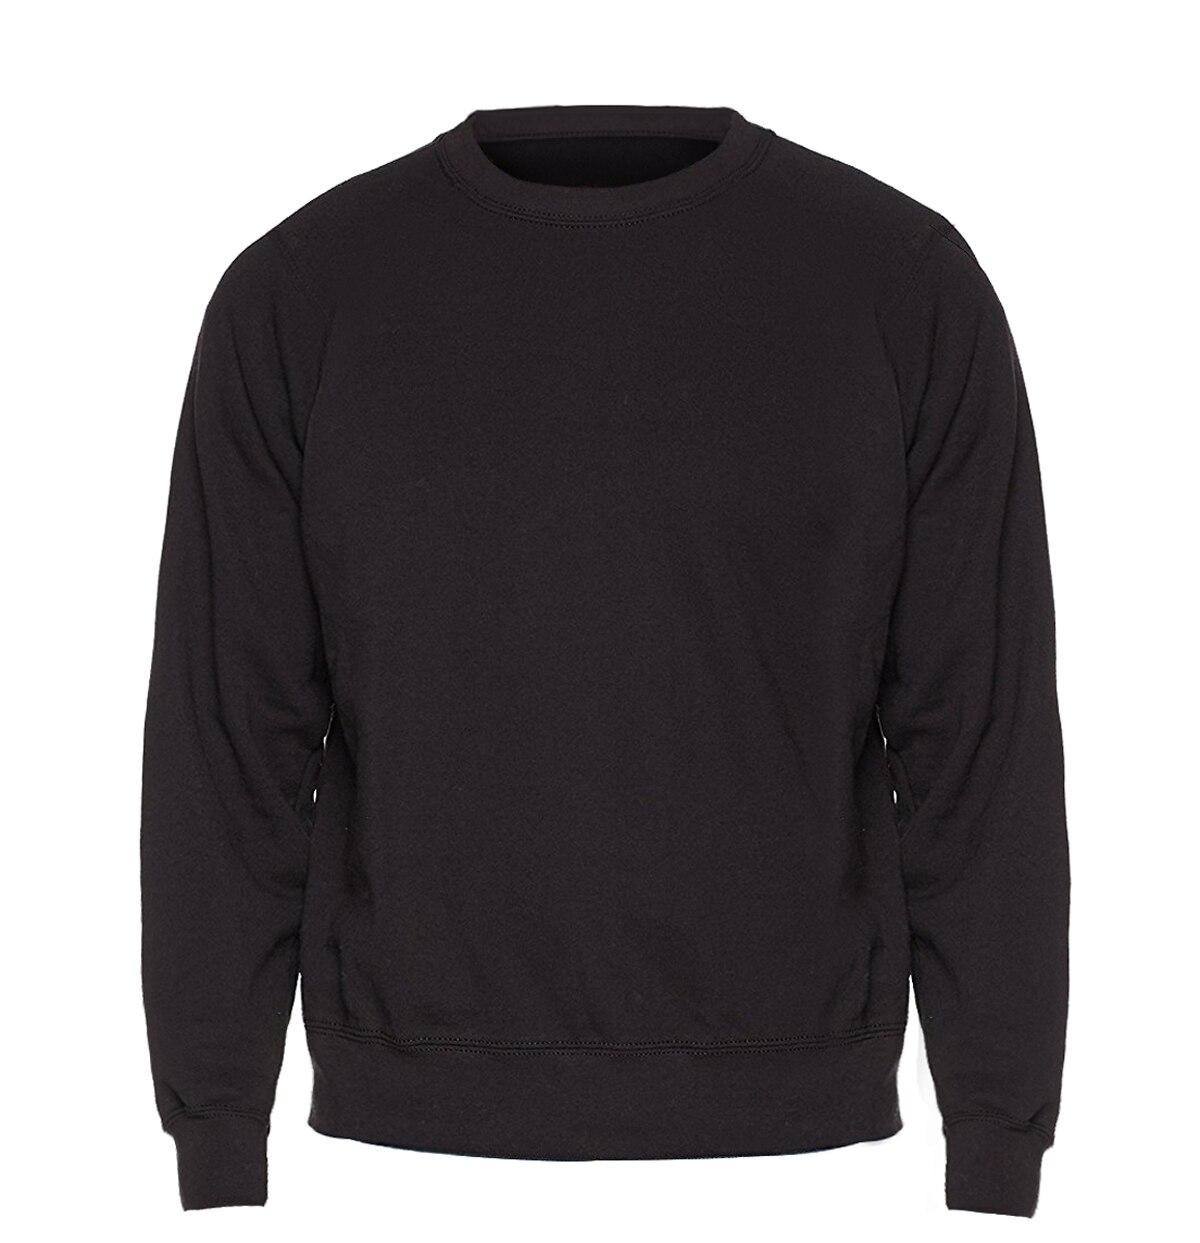 Solid color Sweatshirt Men Hoodie Crewneck Sweatshirts Winter Autumn Fleece Hoody Casual Gray Blue Red Black White Streetwear 19